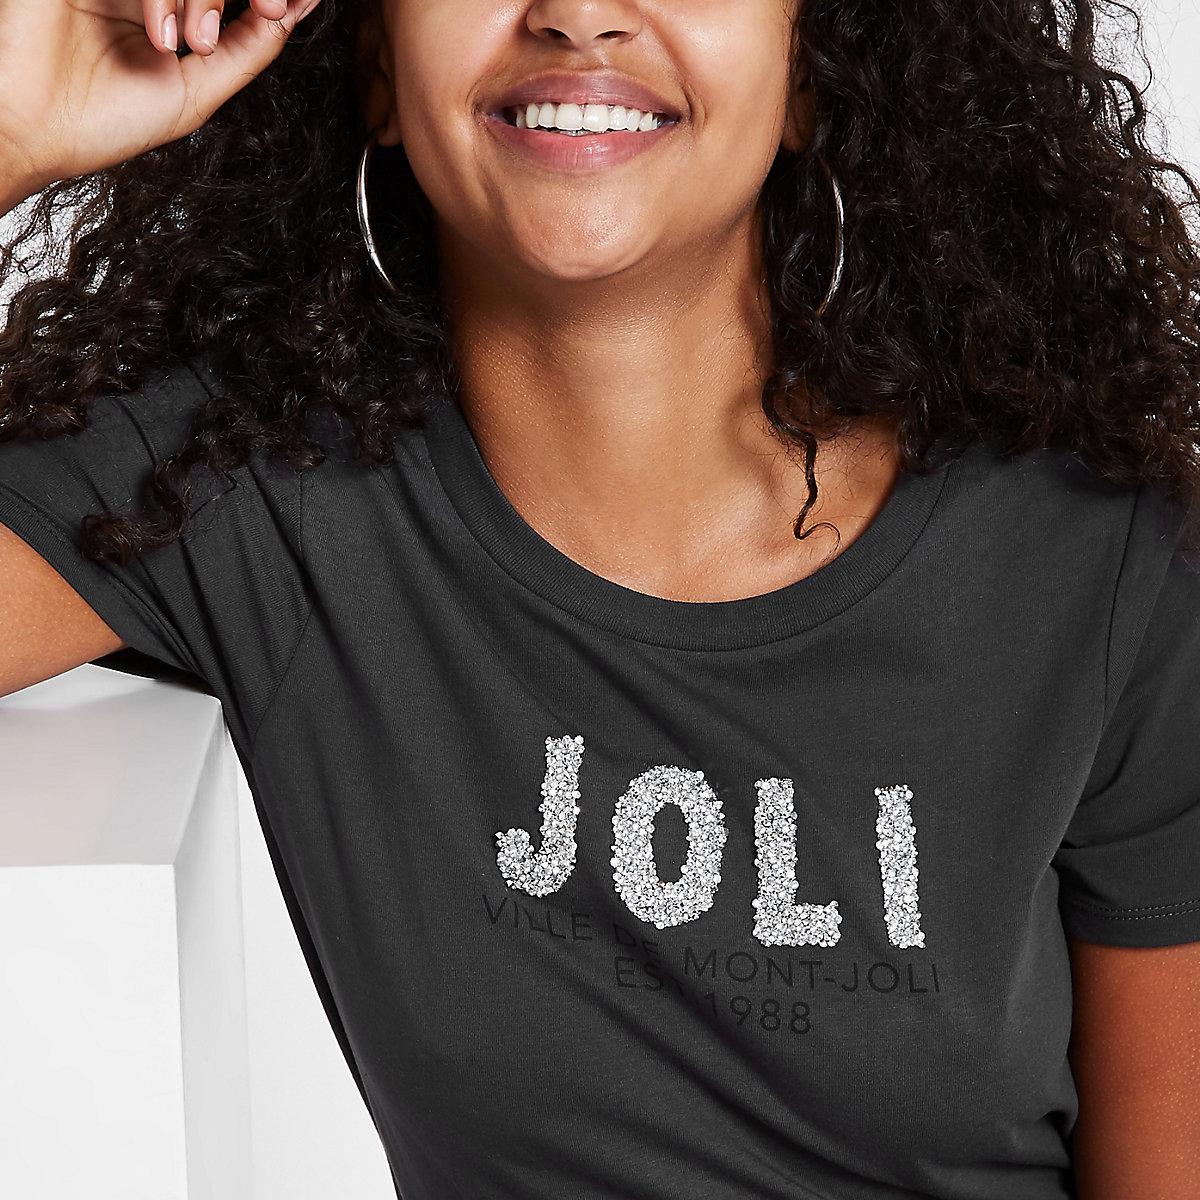 Dark grey 'Joli' diamante embellished T-shirt